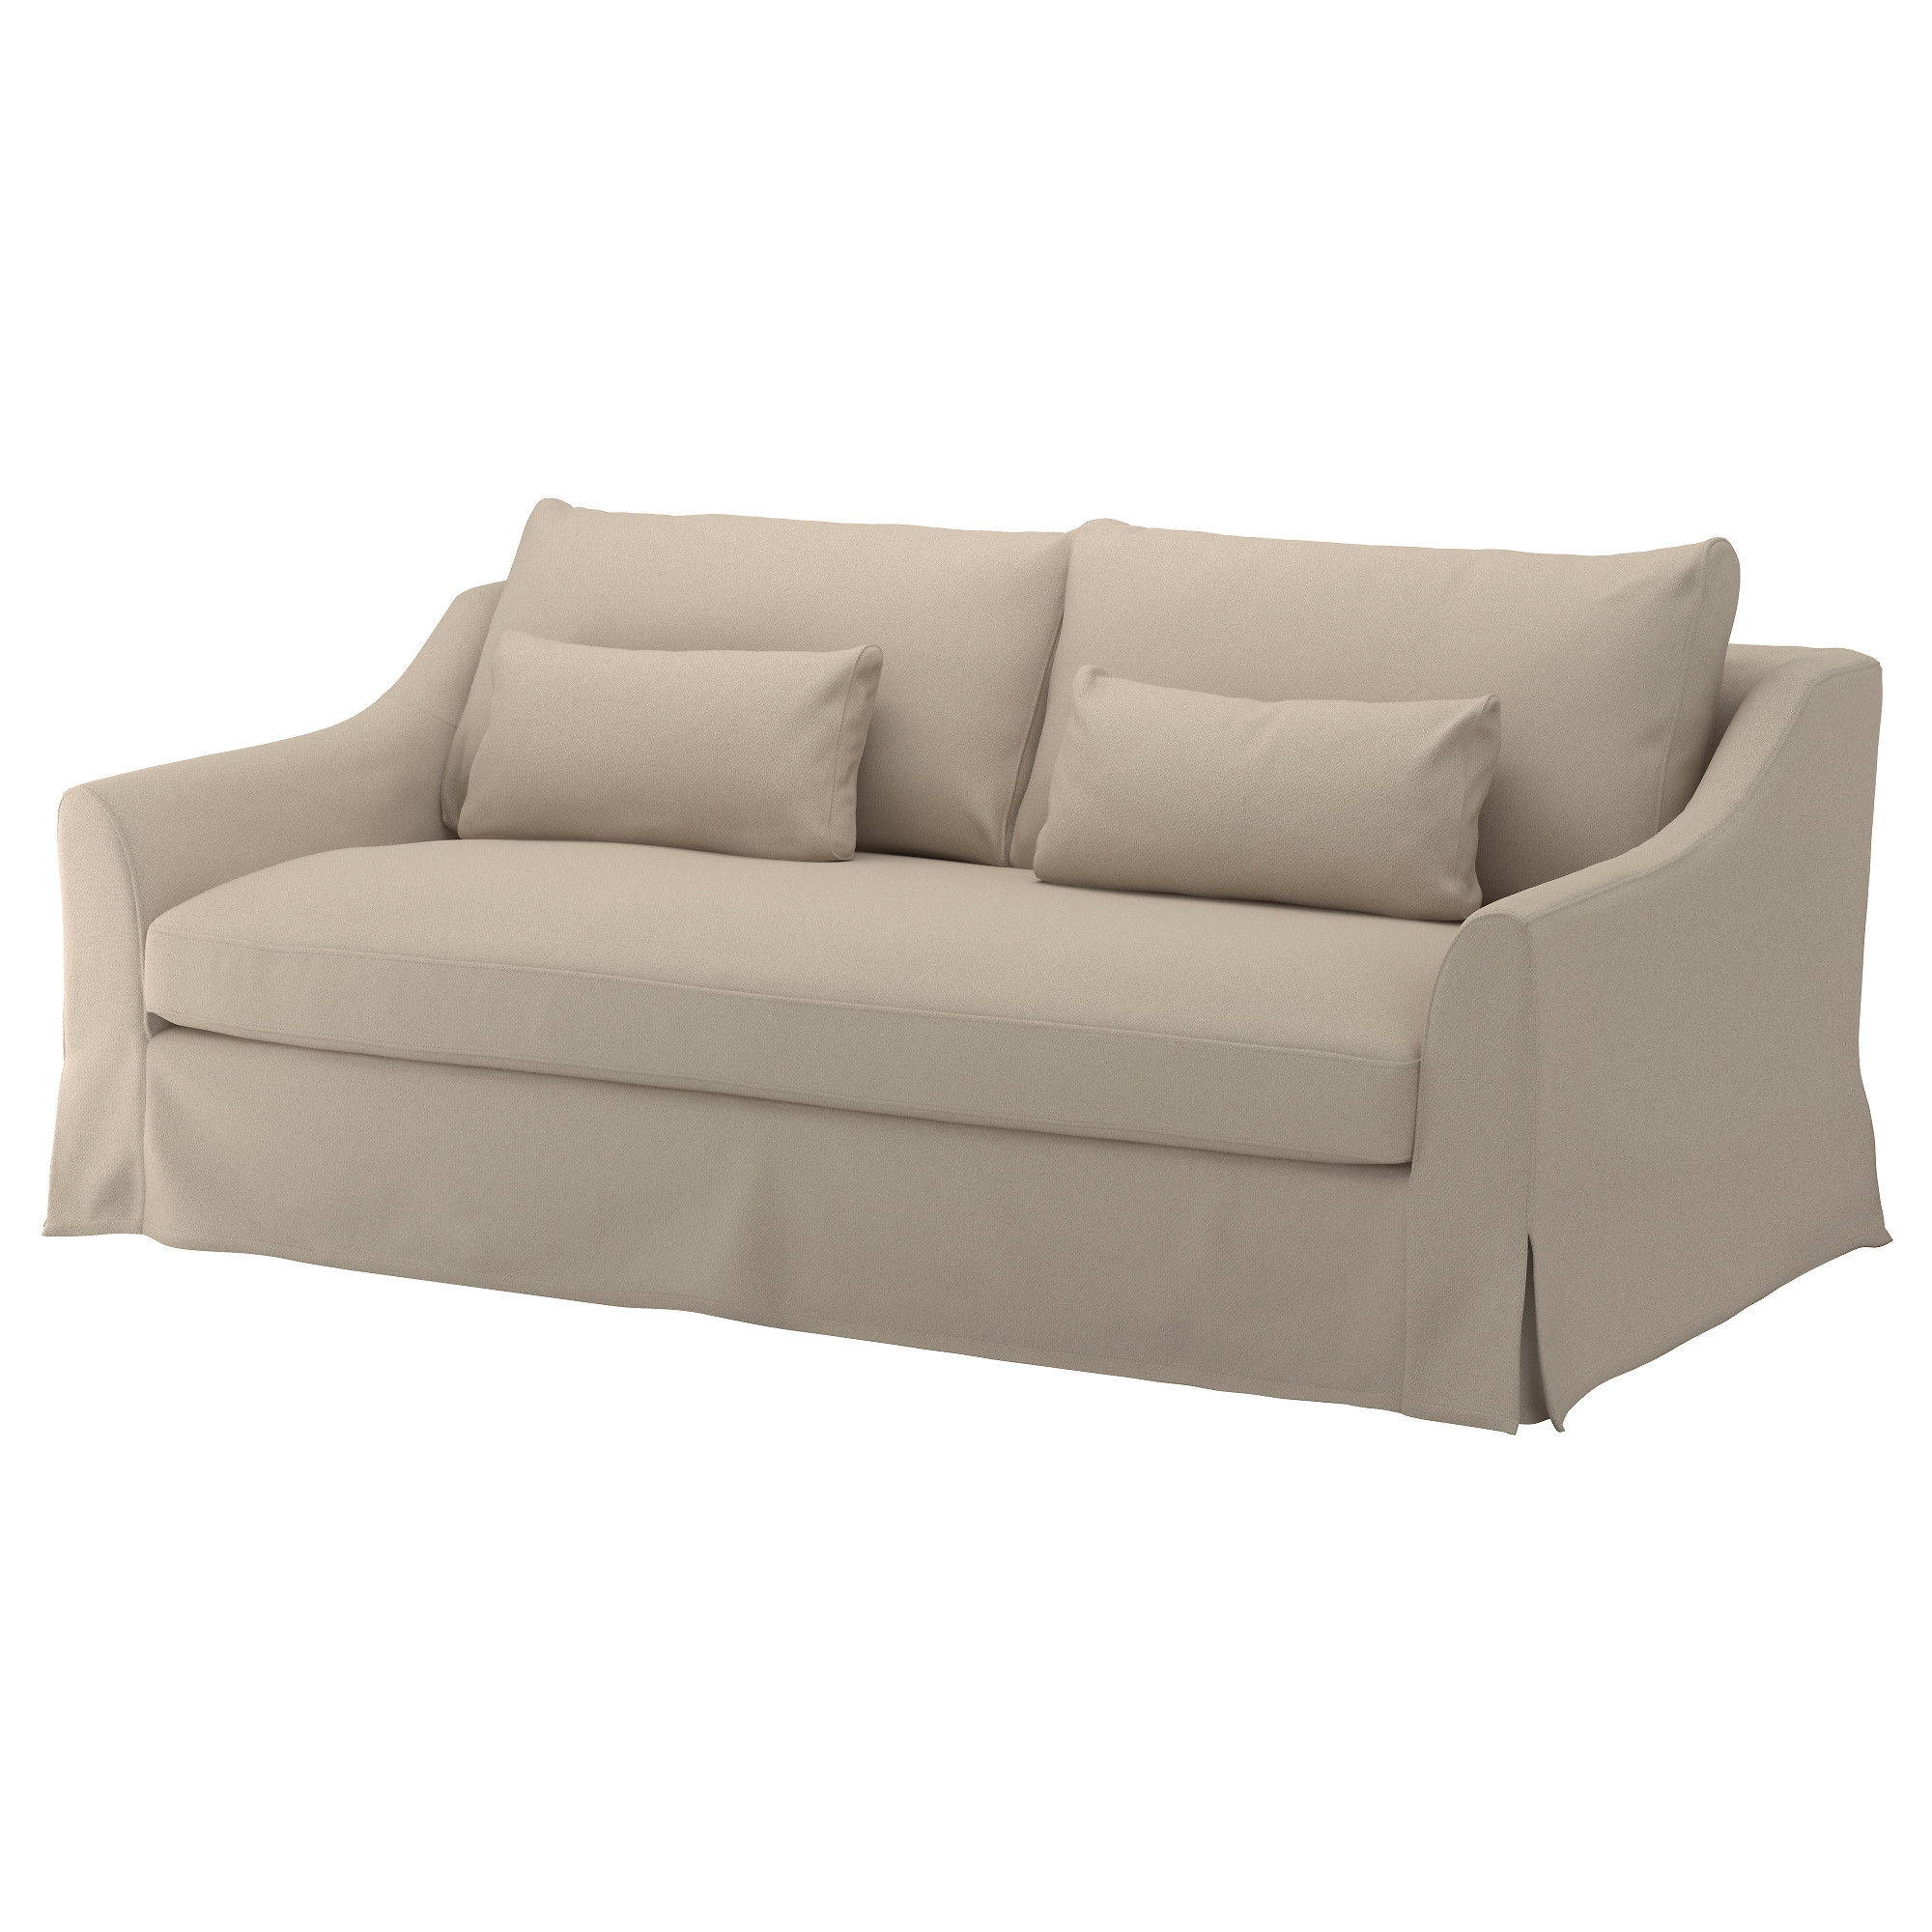 FÄRLÖV Sofa Flodafors beige | Sofa, Fabric sofa